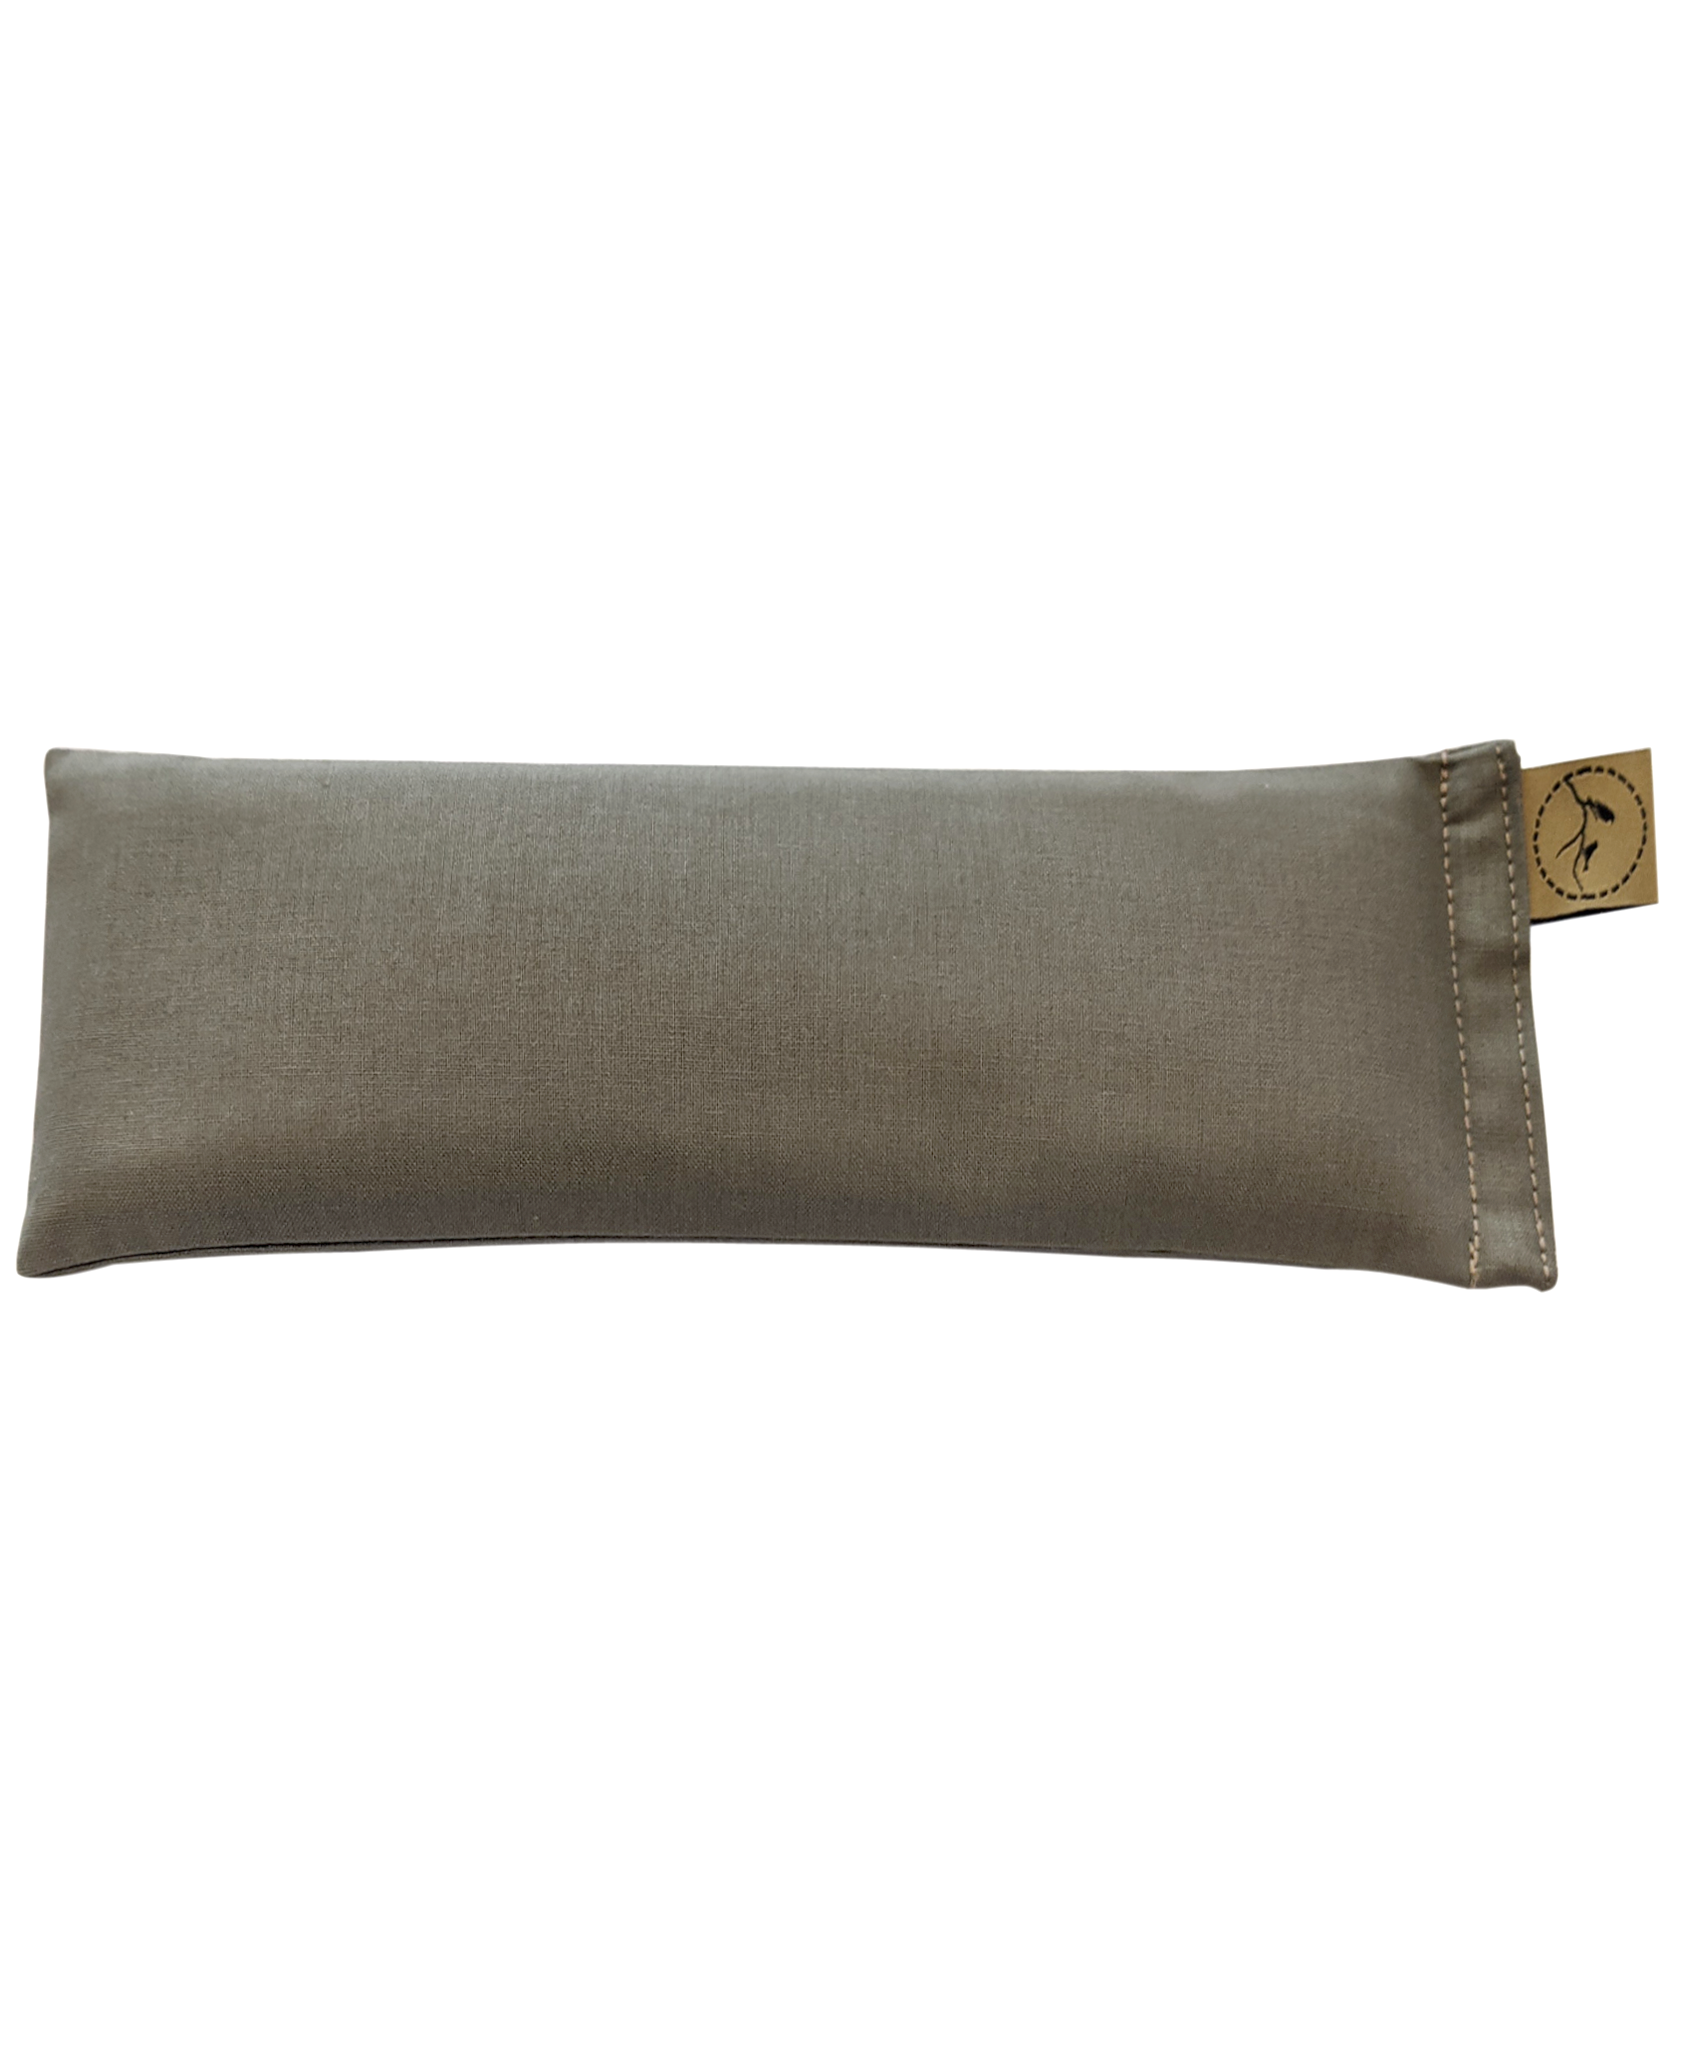 Khaki-eye-pillow-lavender-sore-pain-relief-yoga